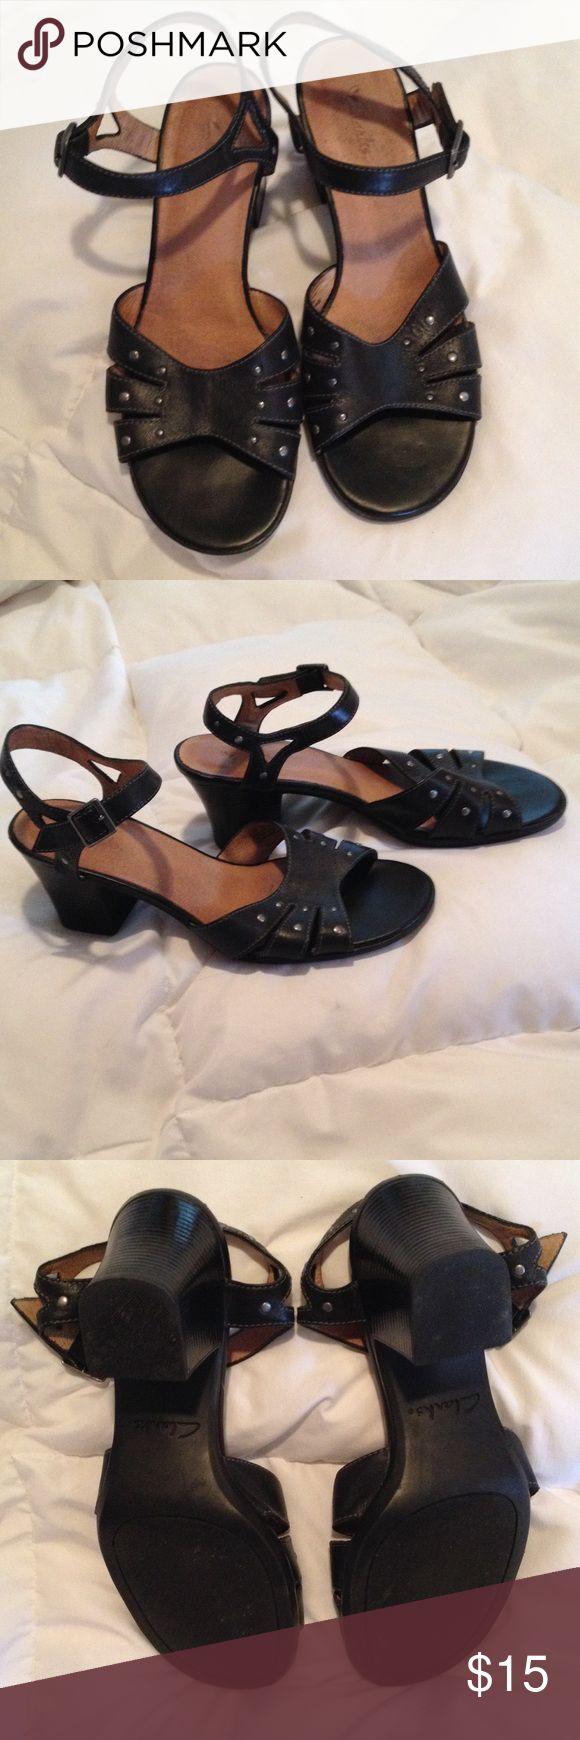 Black sandals 2 inch heel - Black Sandals 2 Inch Heel 47